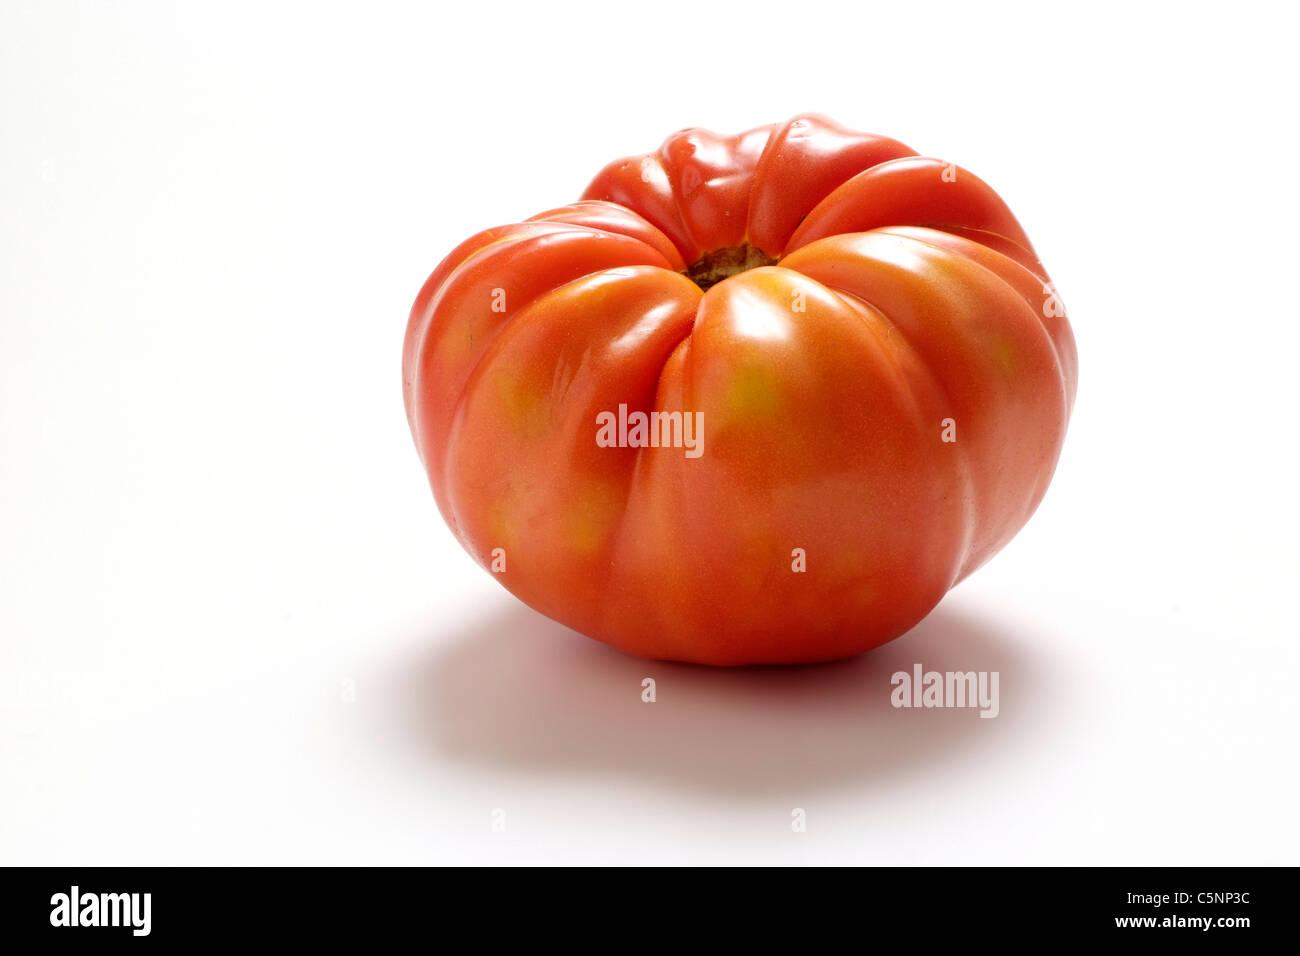 Tomato varieties: Santa Lucia - Stock Image